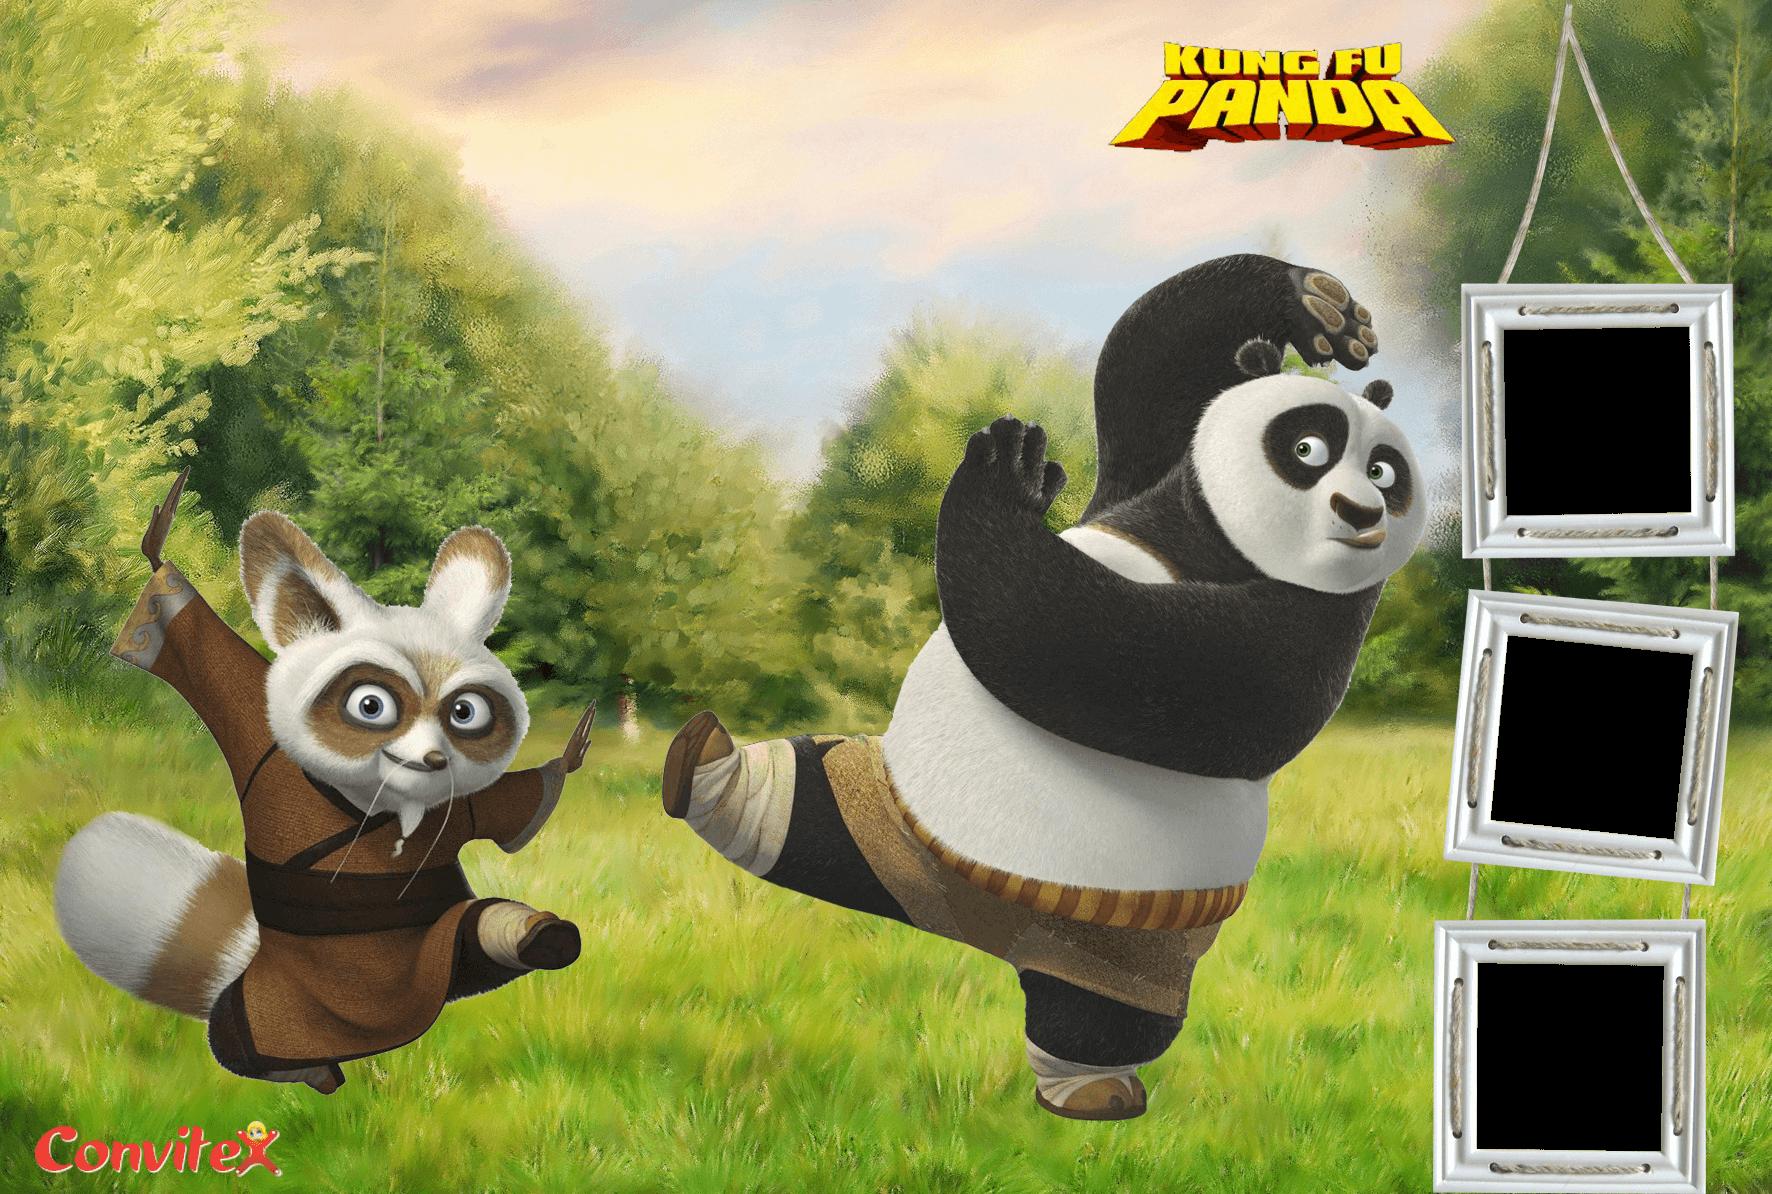 Marco De Foto Kung Fu Panda gratis - Marco De Foto Kung Fu Panda gratis